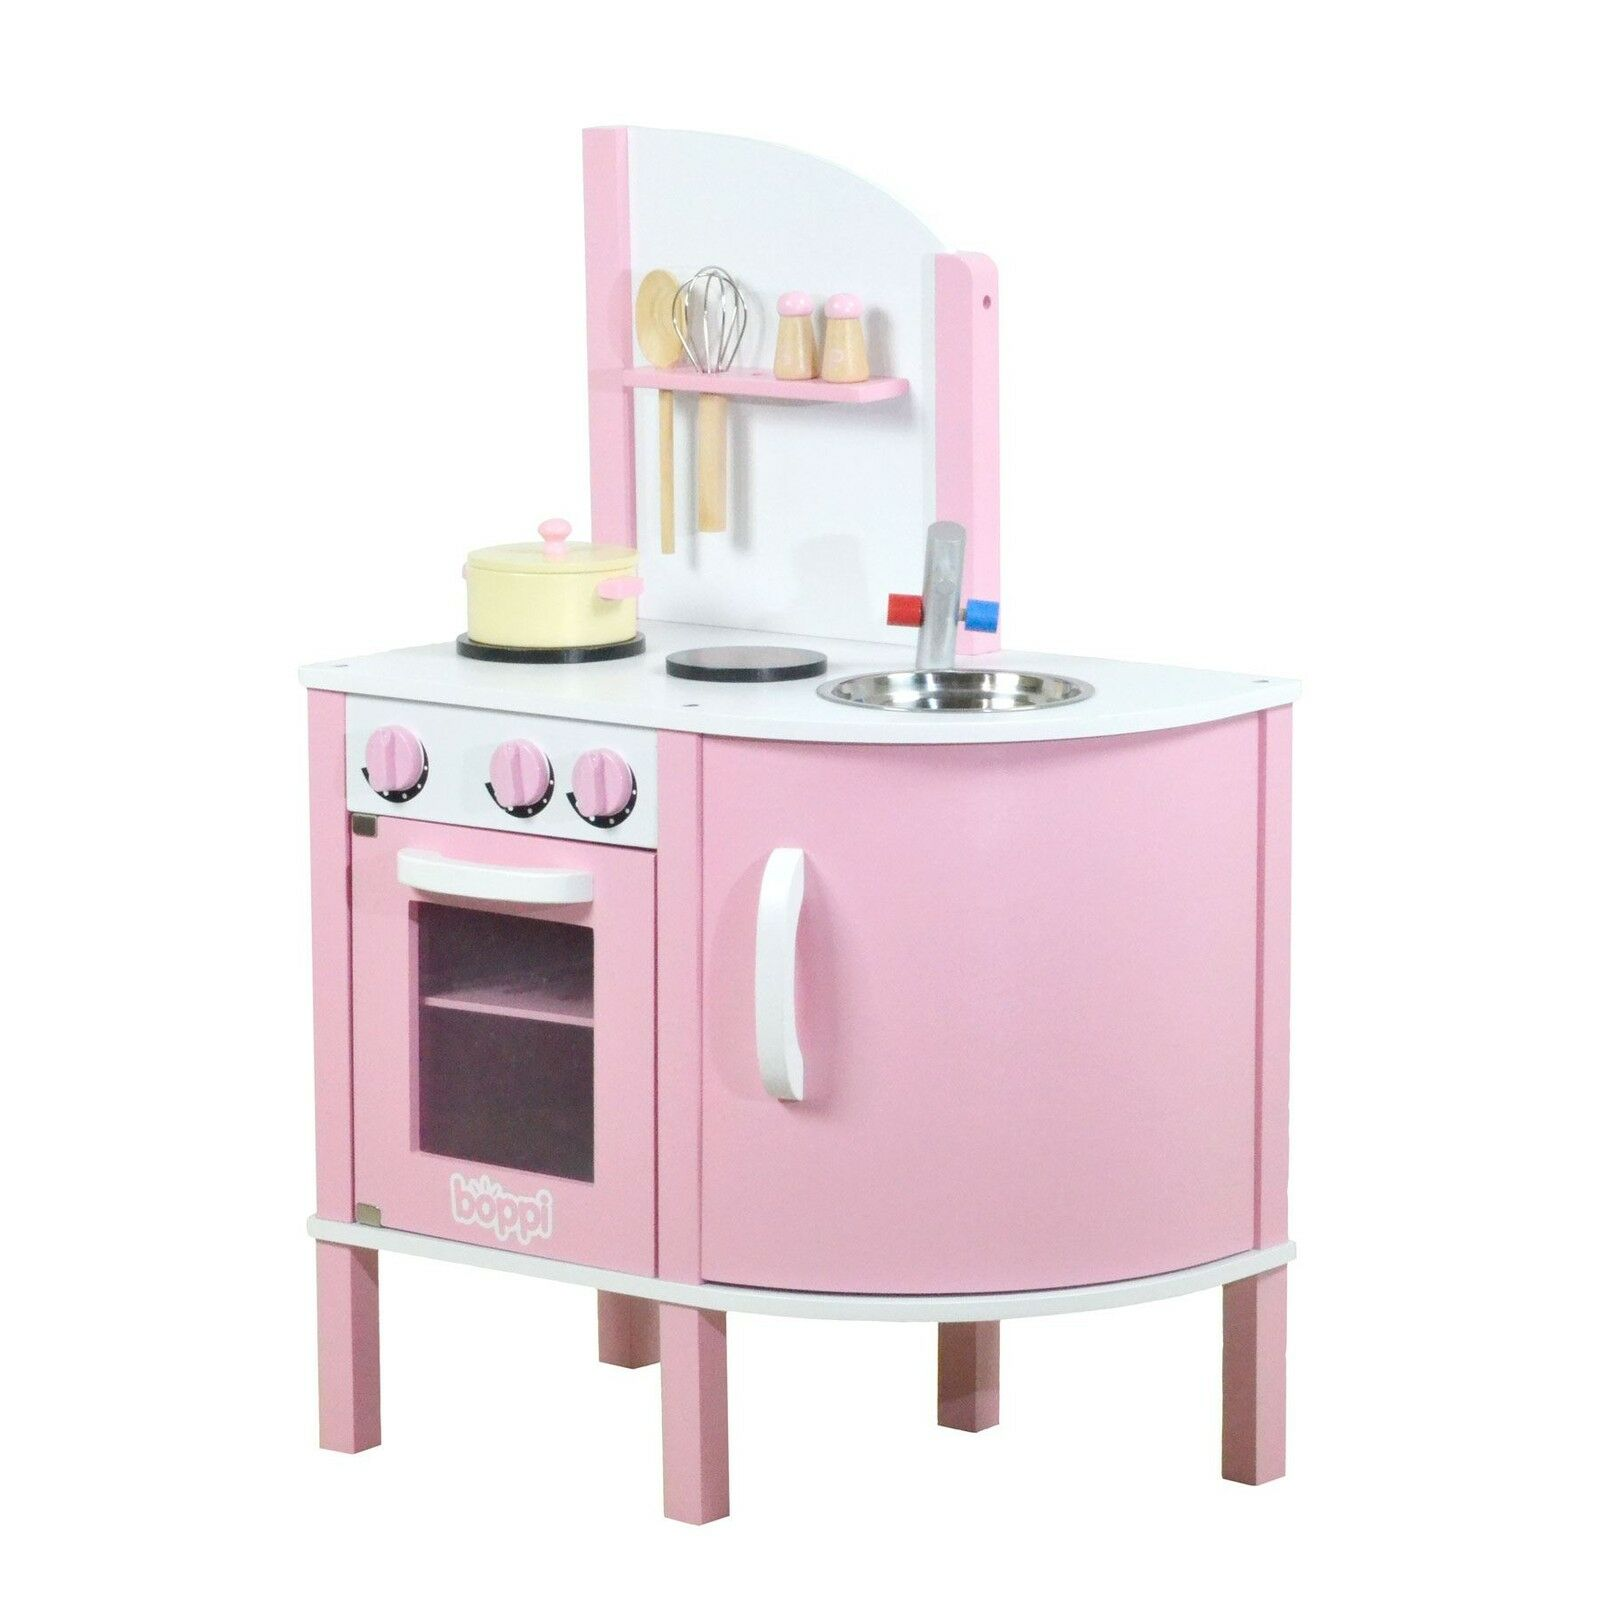 Infantil Niña Madera rosado Cocina Juguete con 5 Piezas Accesorios Set